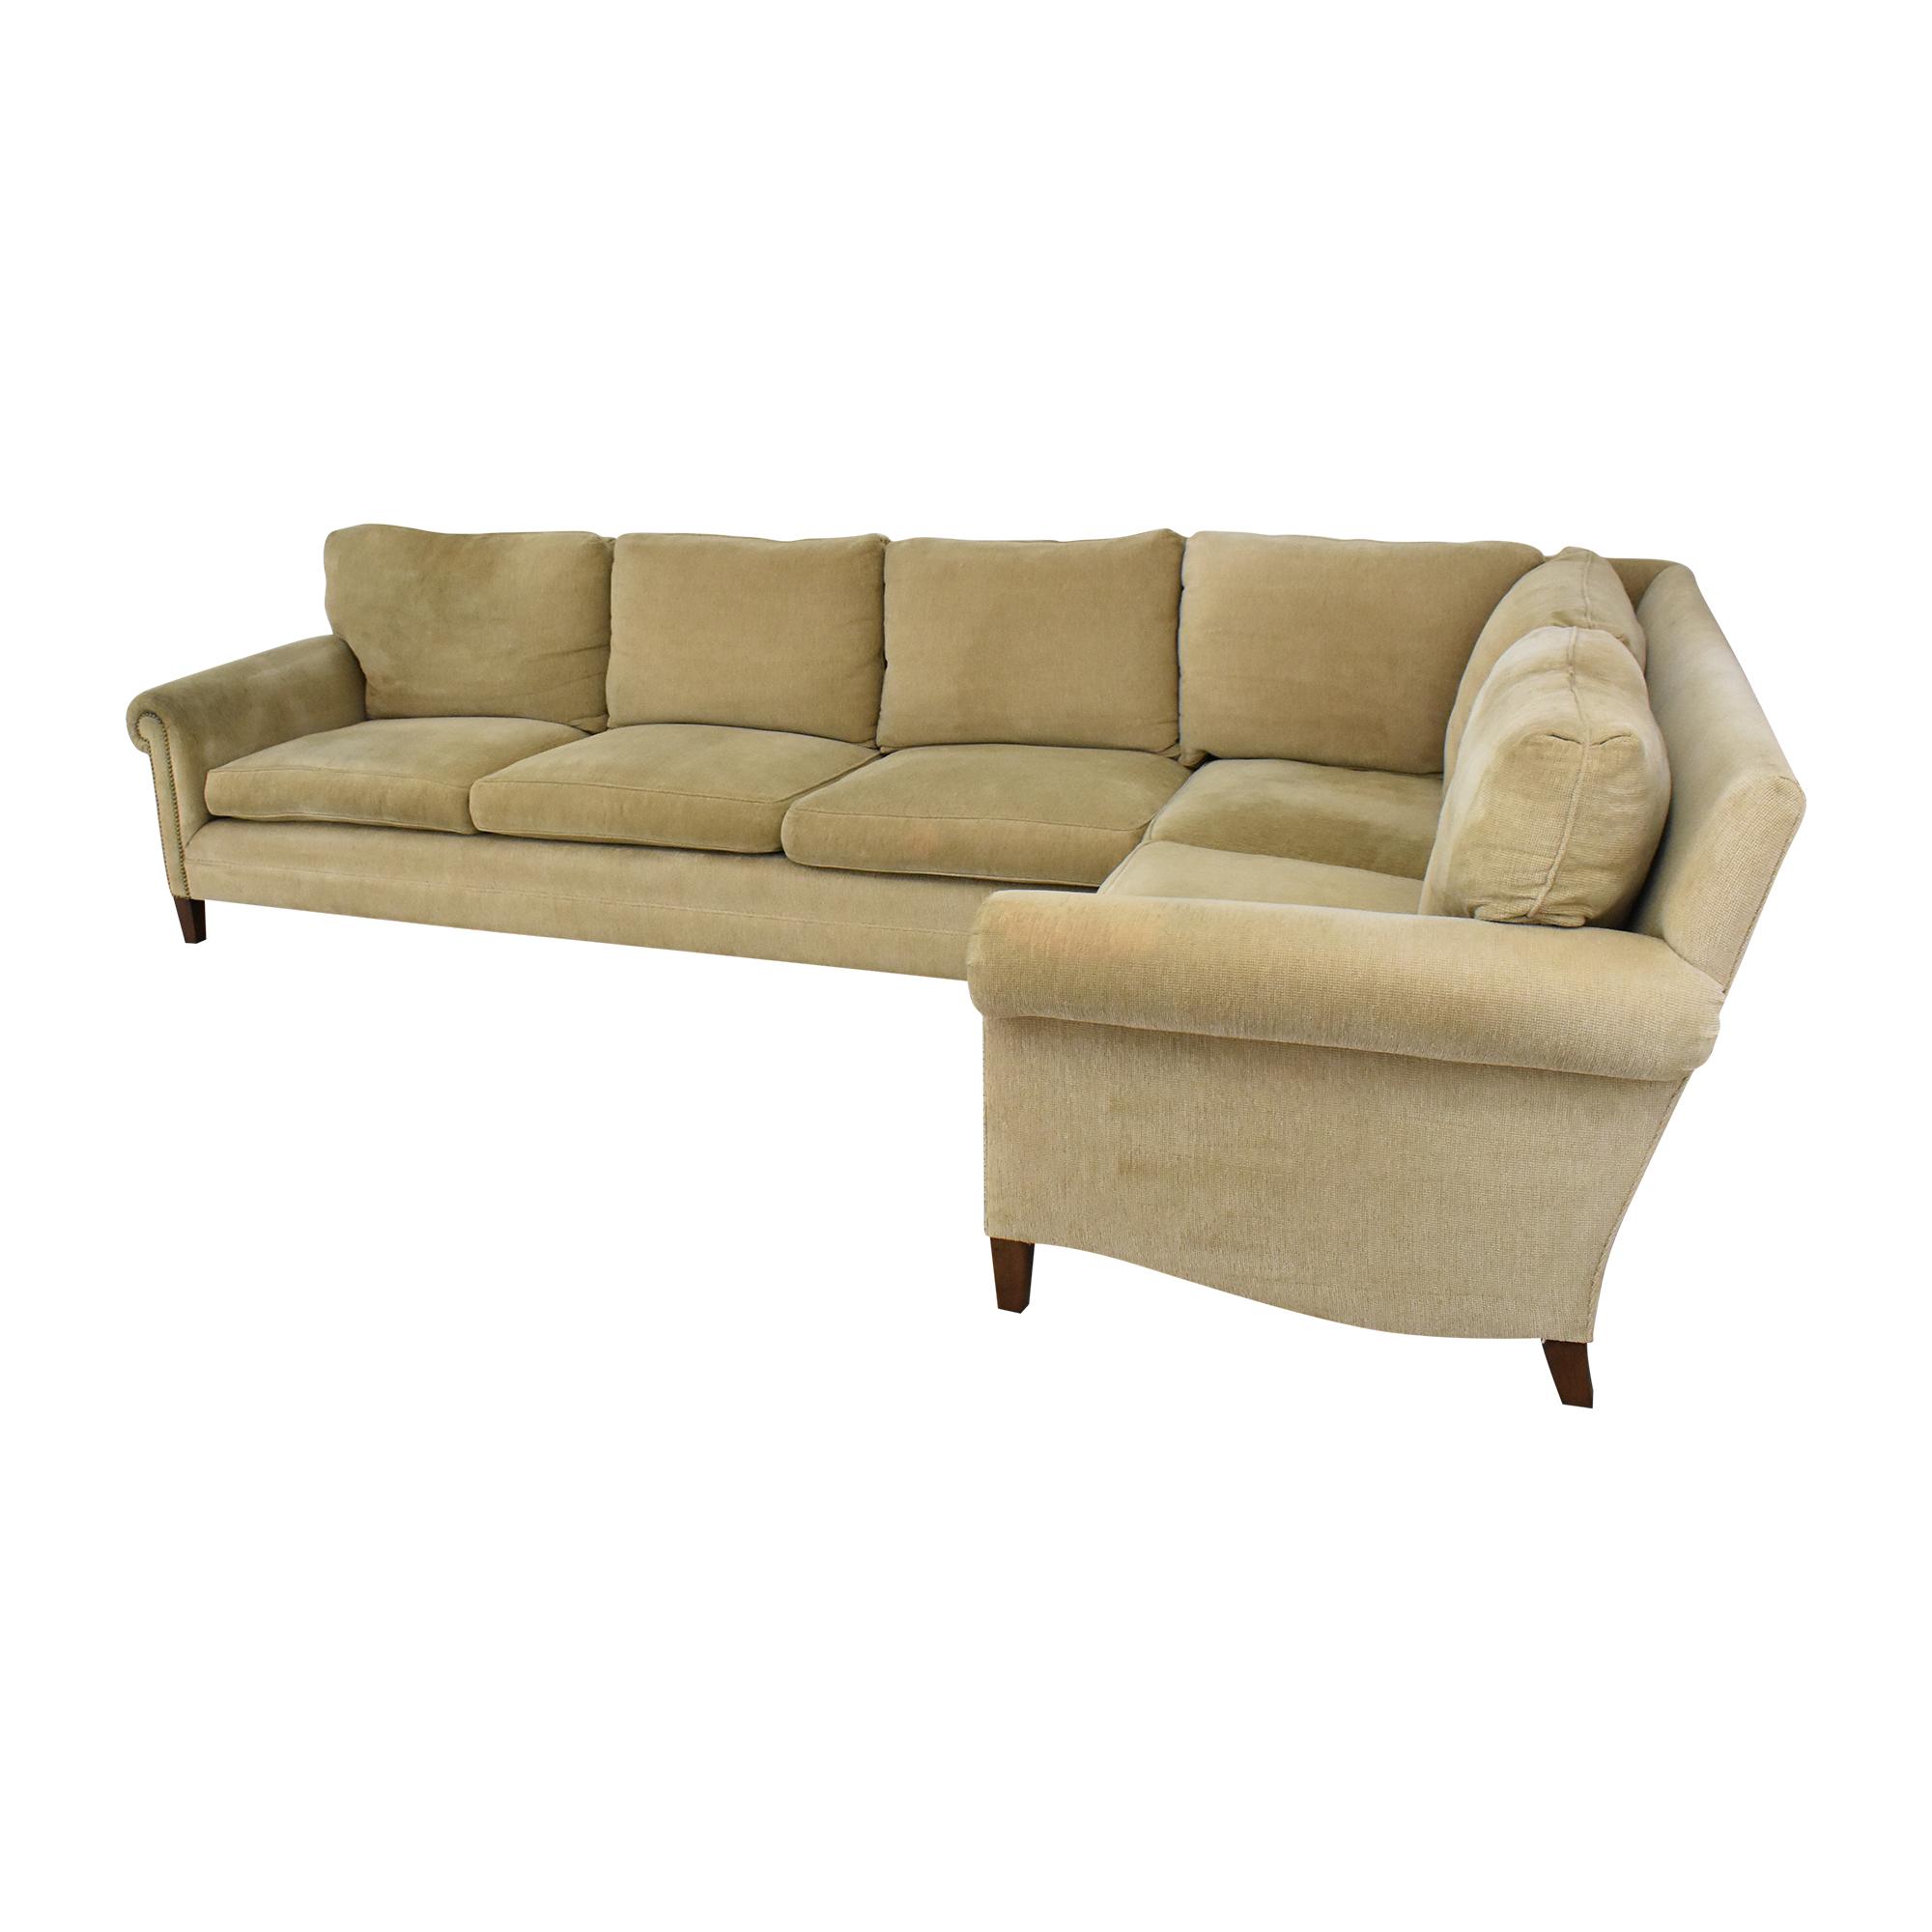 Custom L-Shaped Roll Arm Sectional Sofa ct